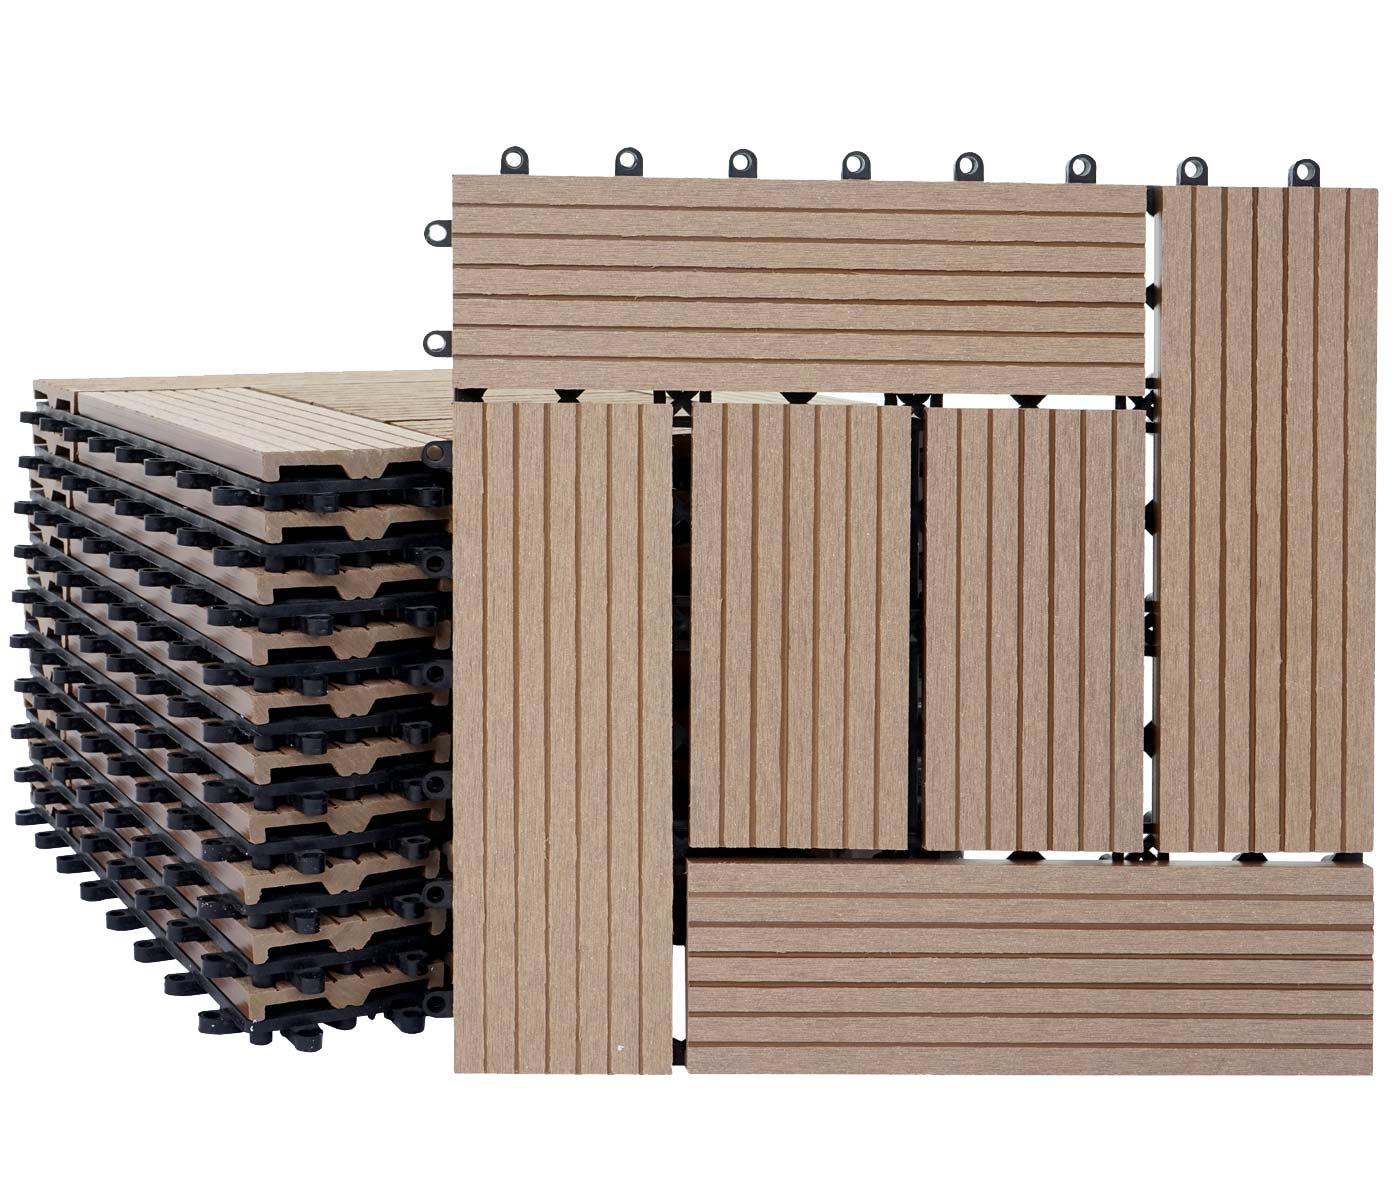 1qm wpc holz fliesen sarthe bodenfliesen balkon terrasse teak versetzt. Black Bedroom Furniture Sets. Home Design Ideas